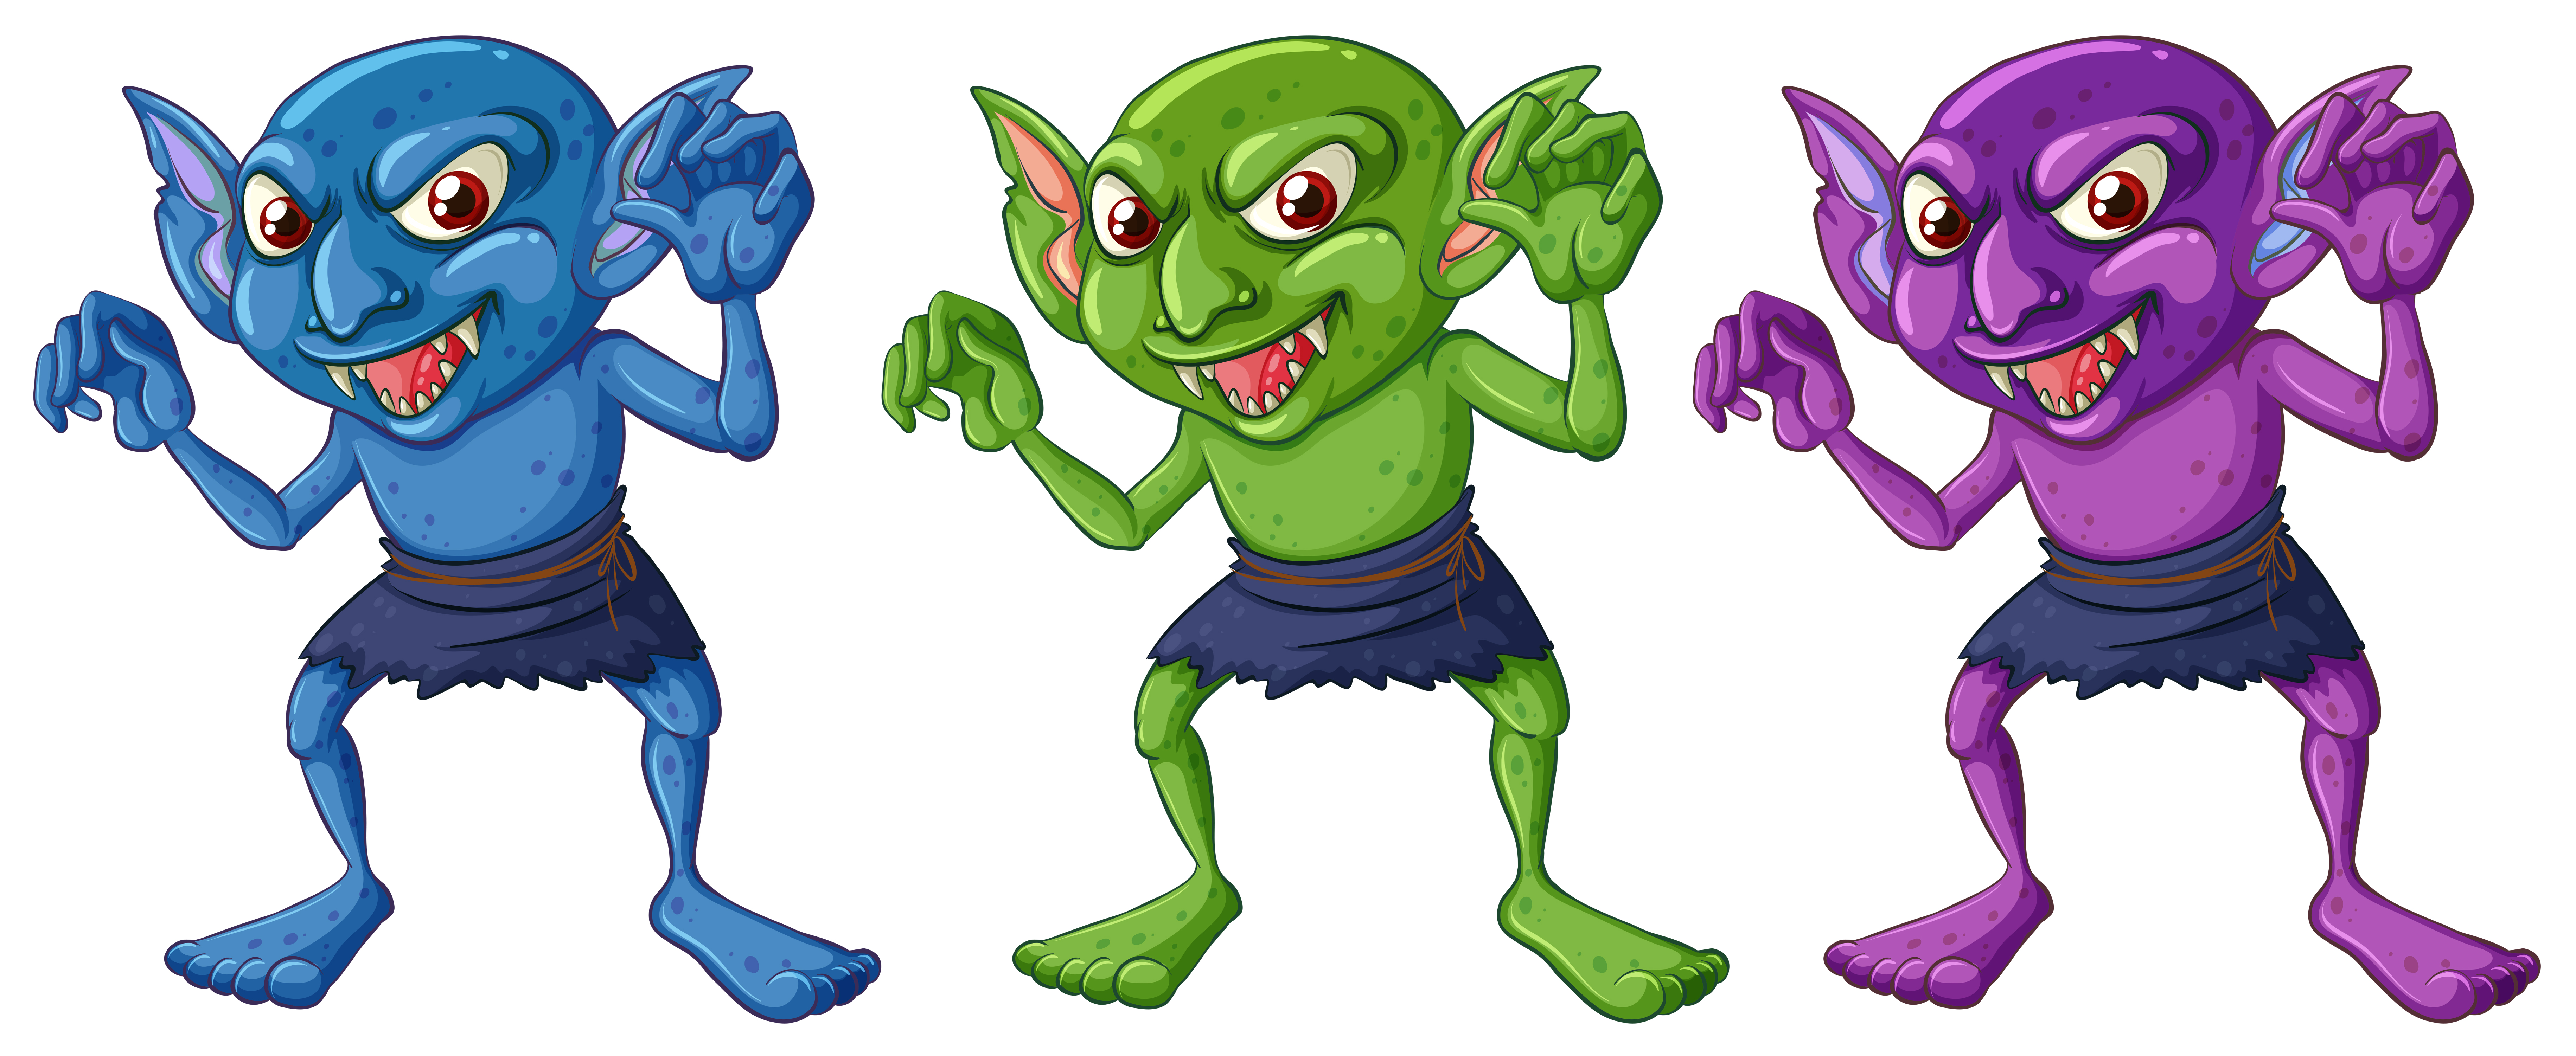 Green Goblin Free Vector Art.